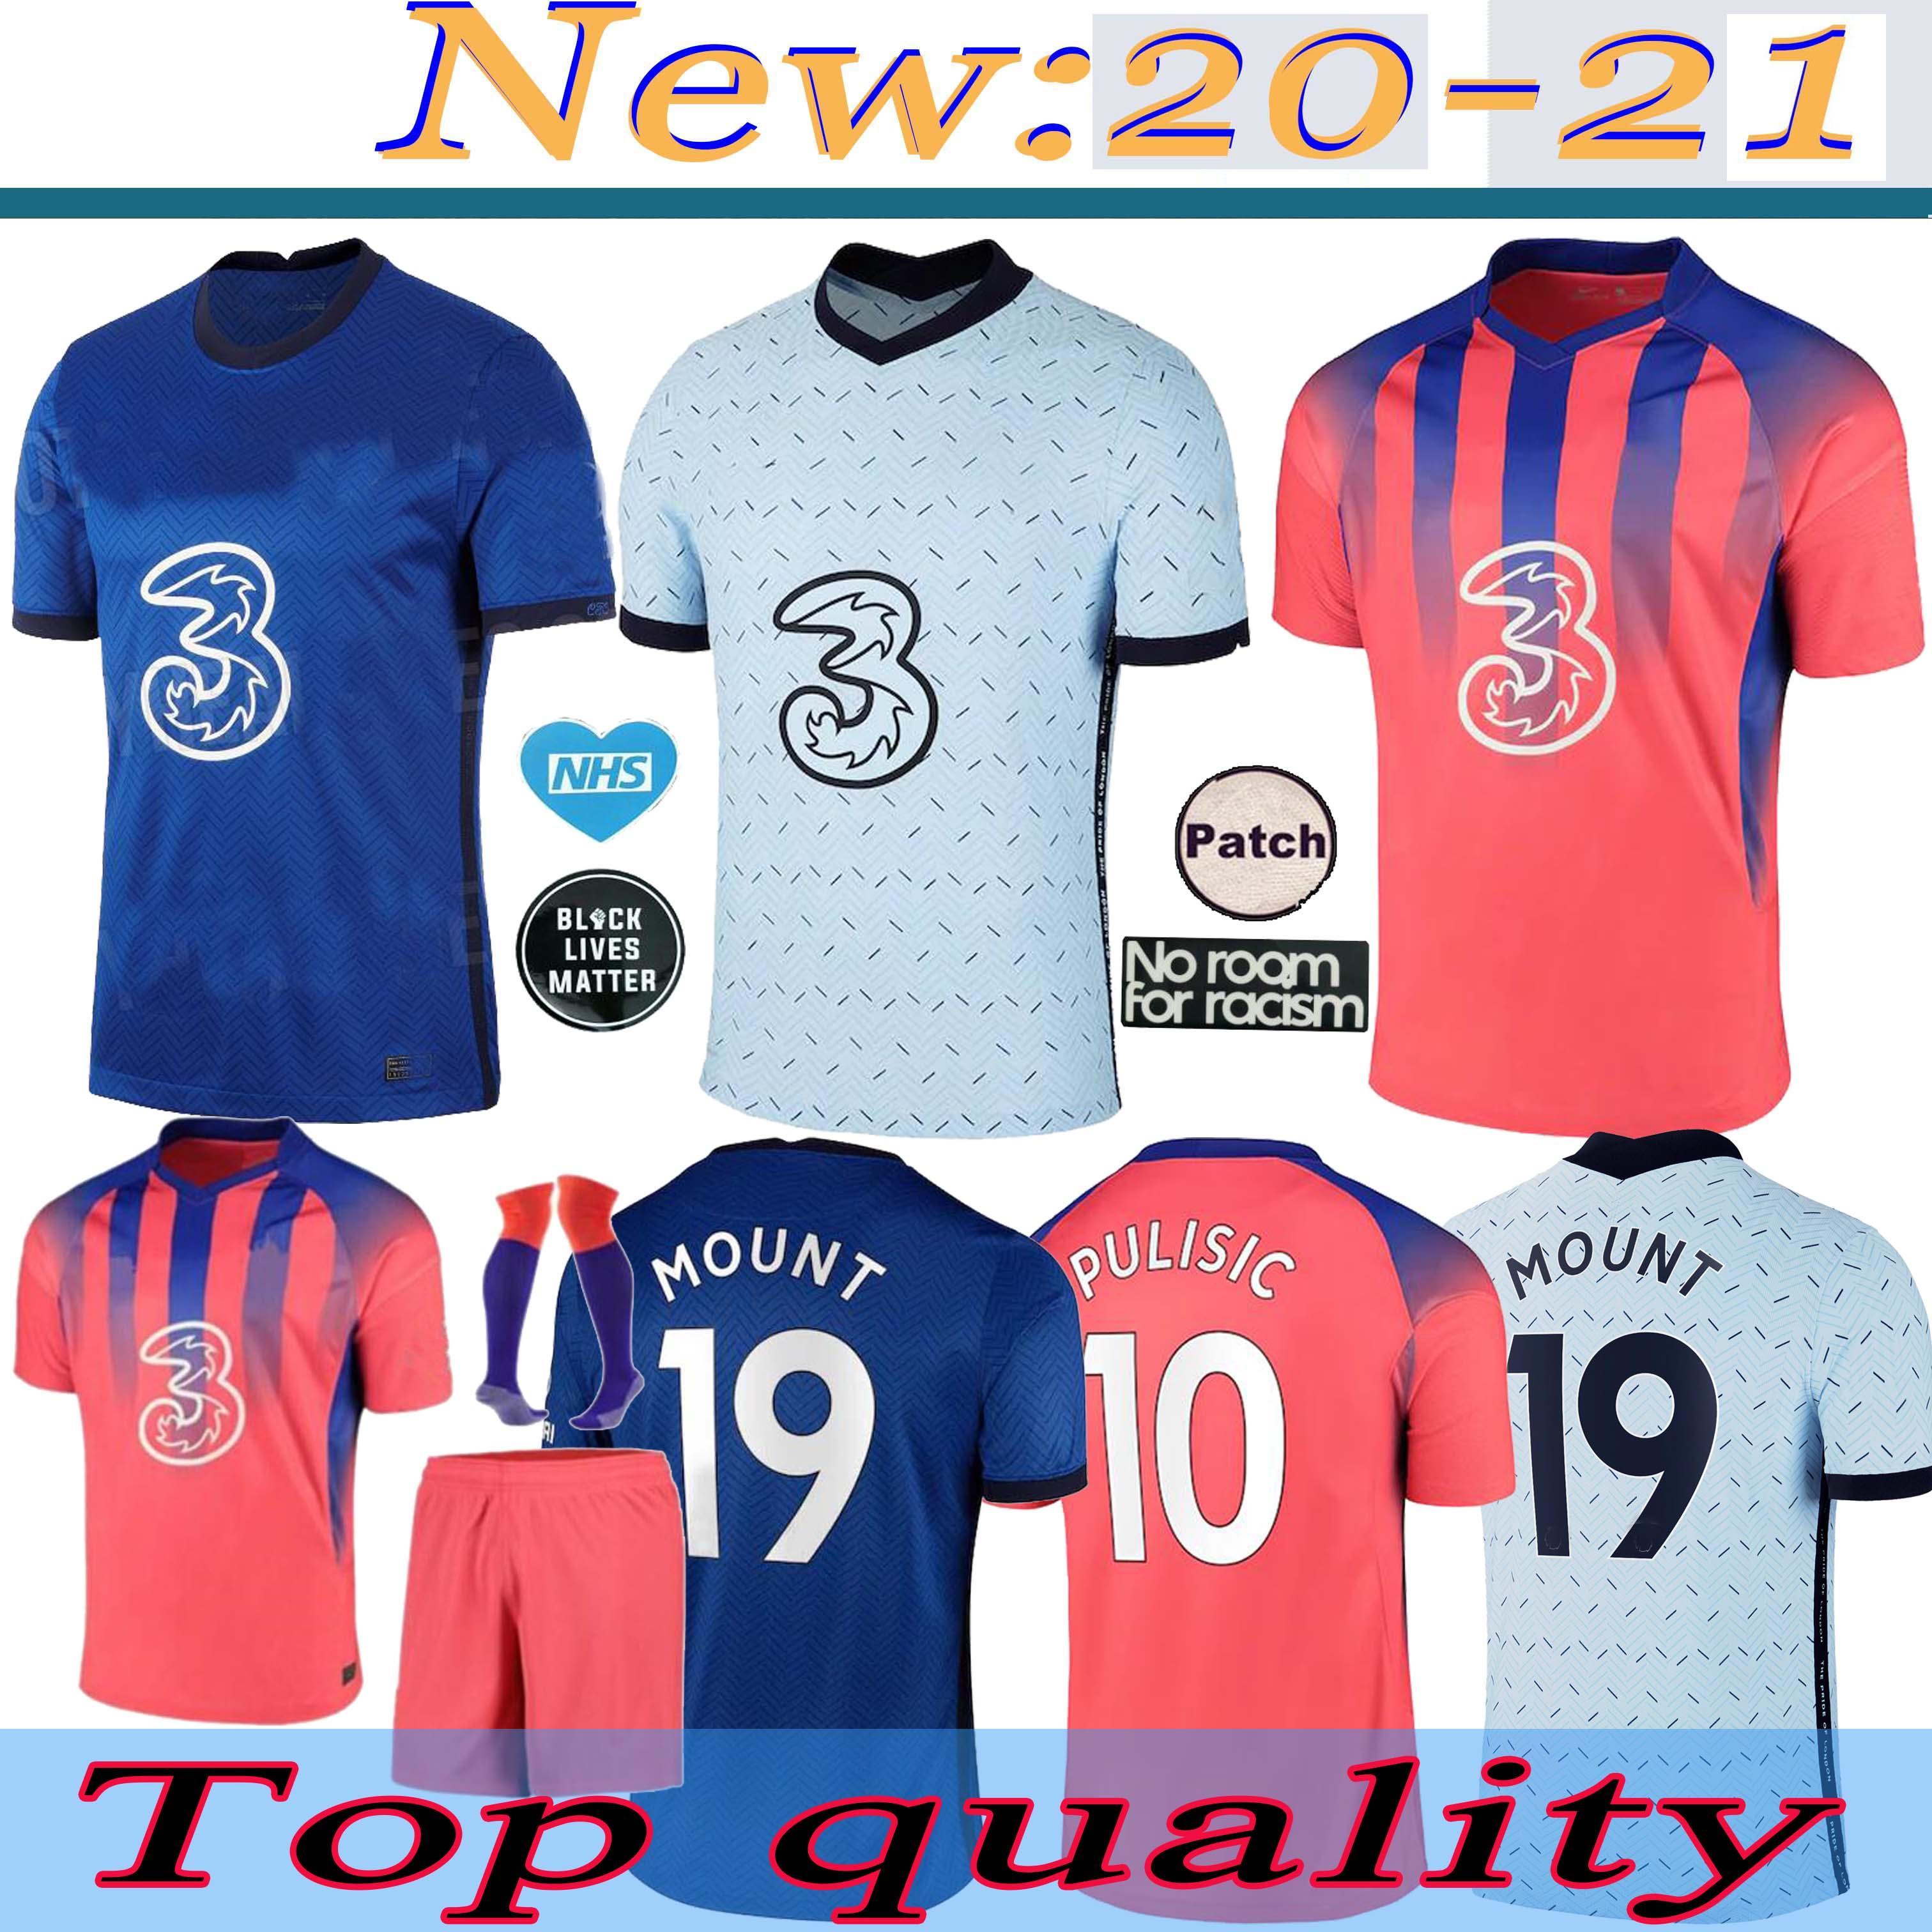 20 21 Player Version Fußball-Trikot havertz ZIYECH Fußballhemd ABRAHAM MOUNT Pulišić camiseta de fútbol 2021 KANTE LAMPARD maillot de foot